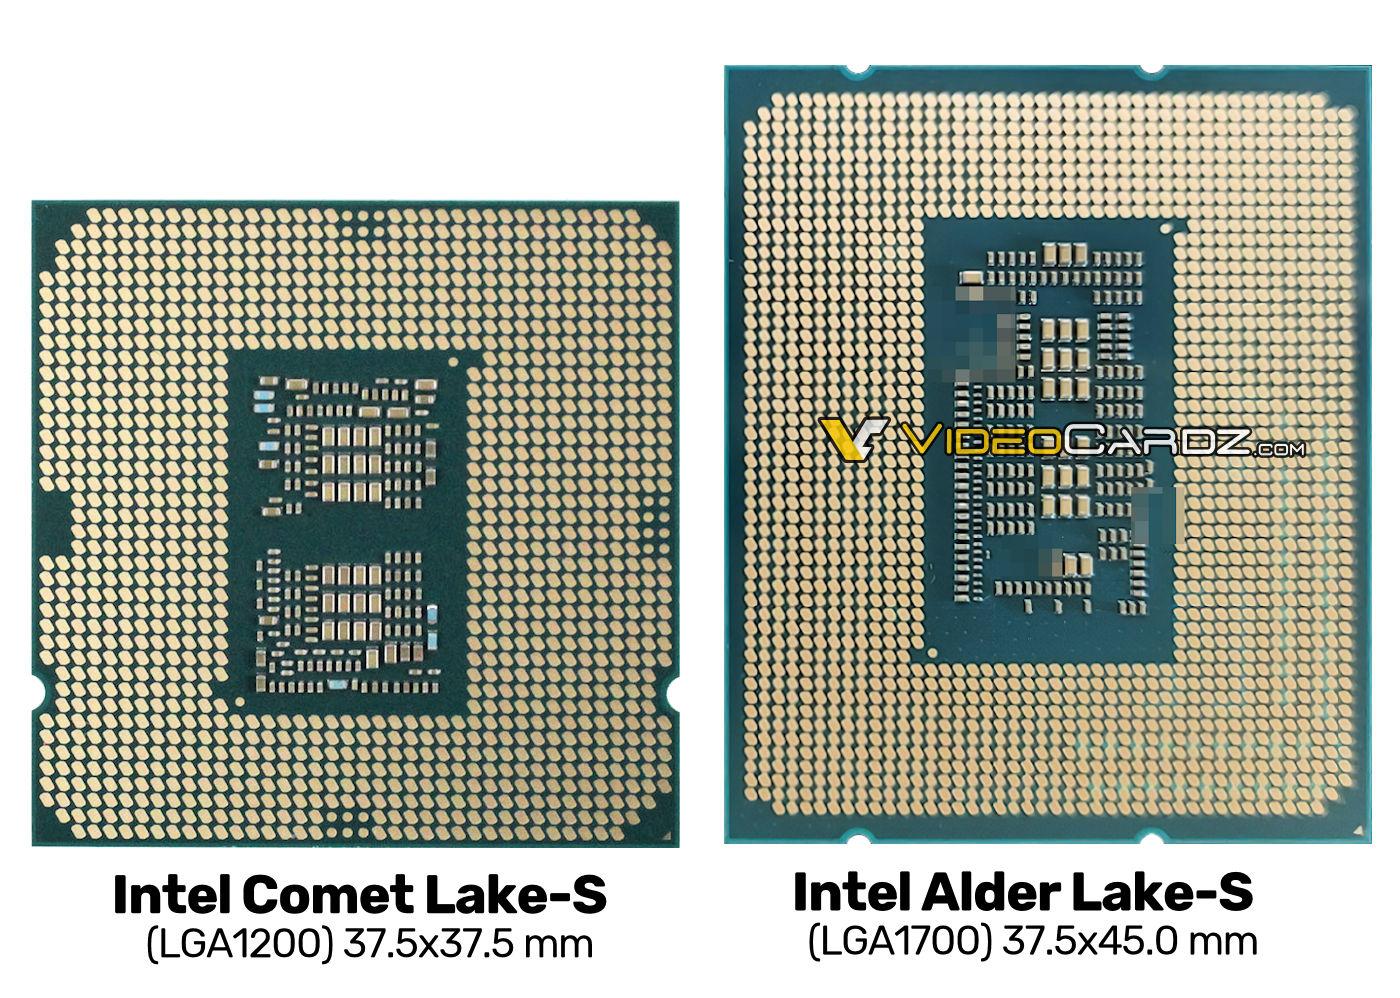 Intel Alder Lake-S LGA-1700 Vergleich mit LGA-1200 Comet Lake-S